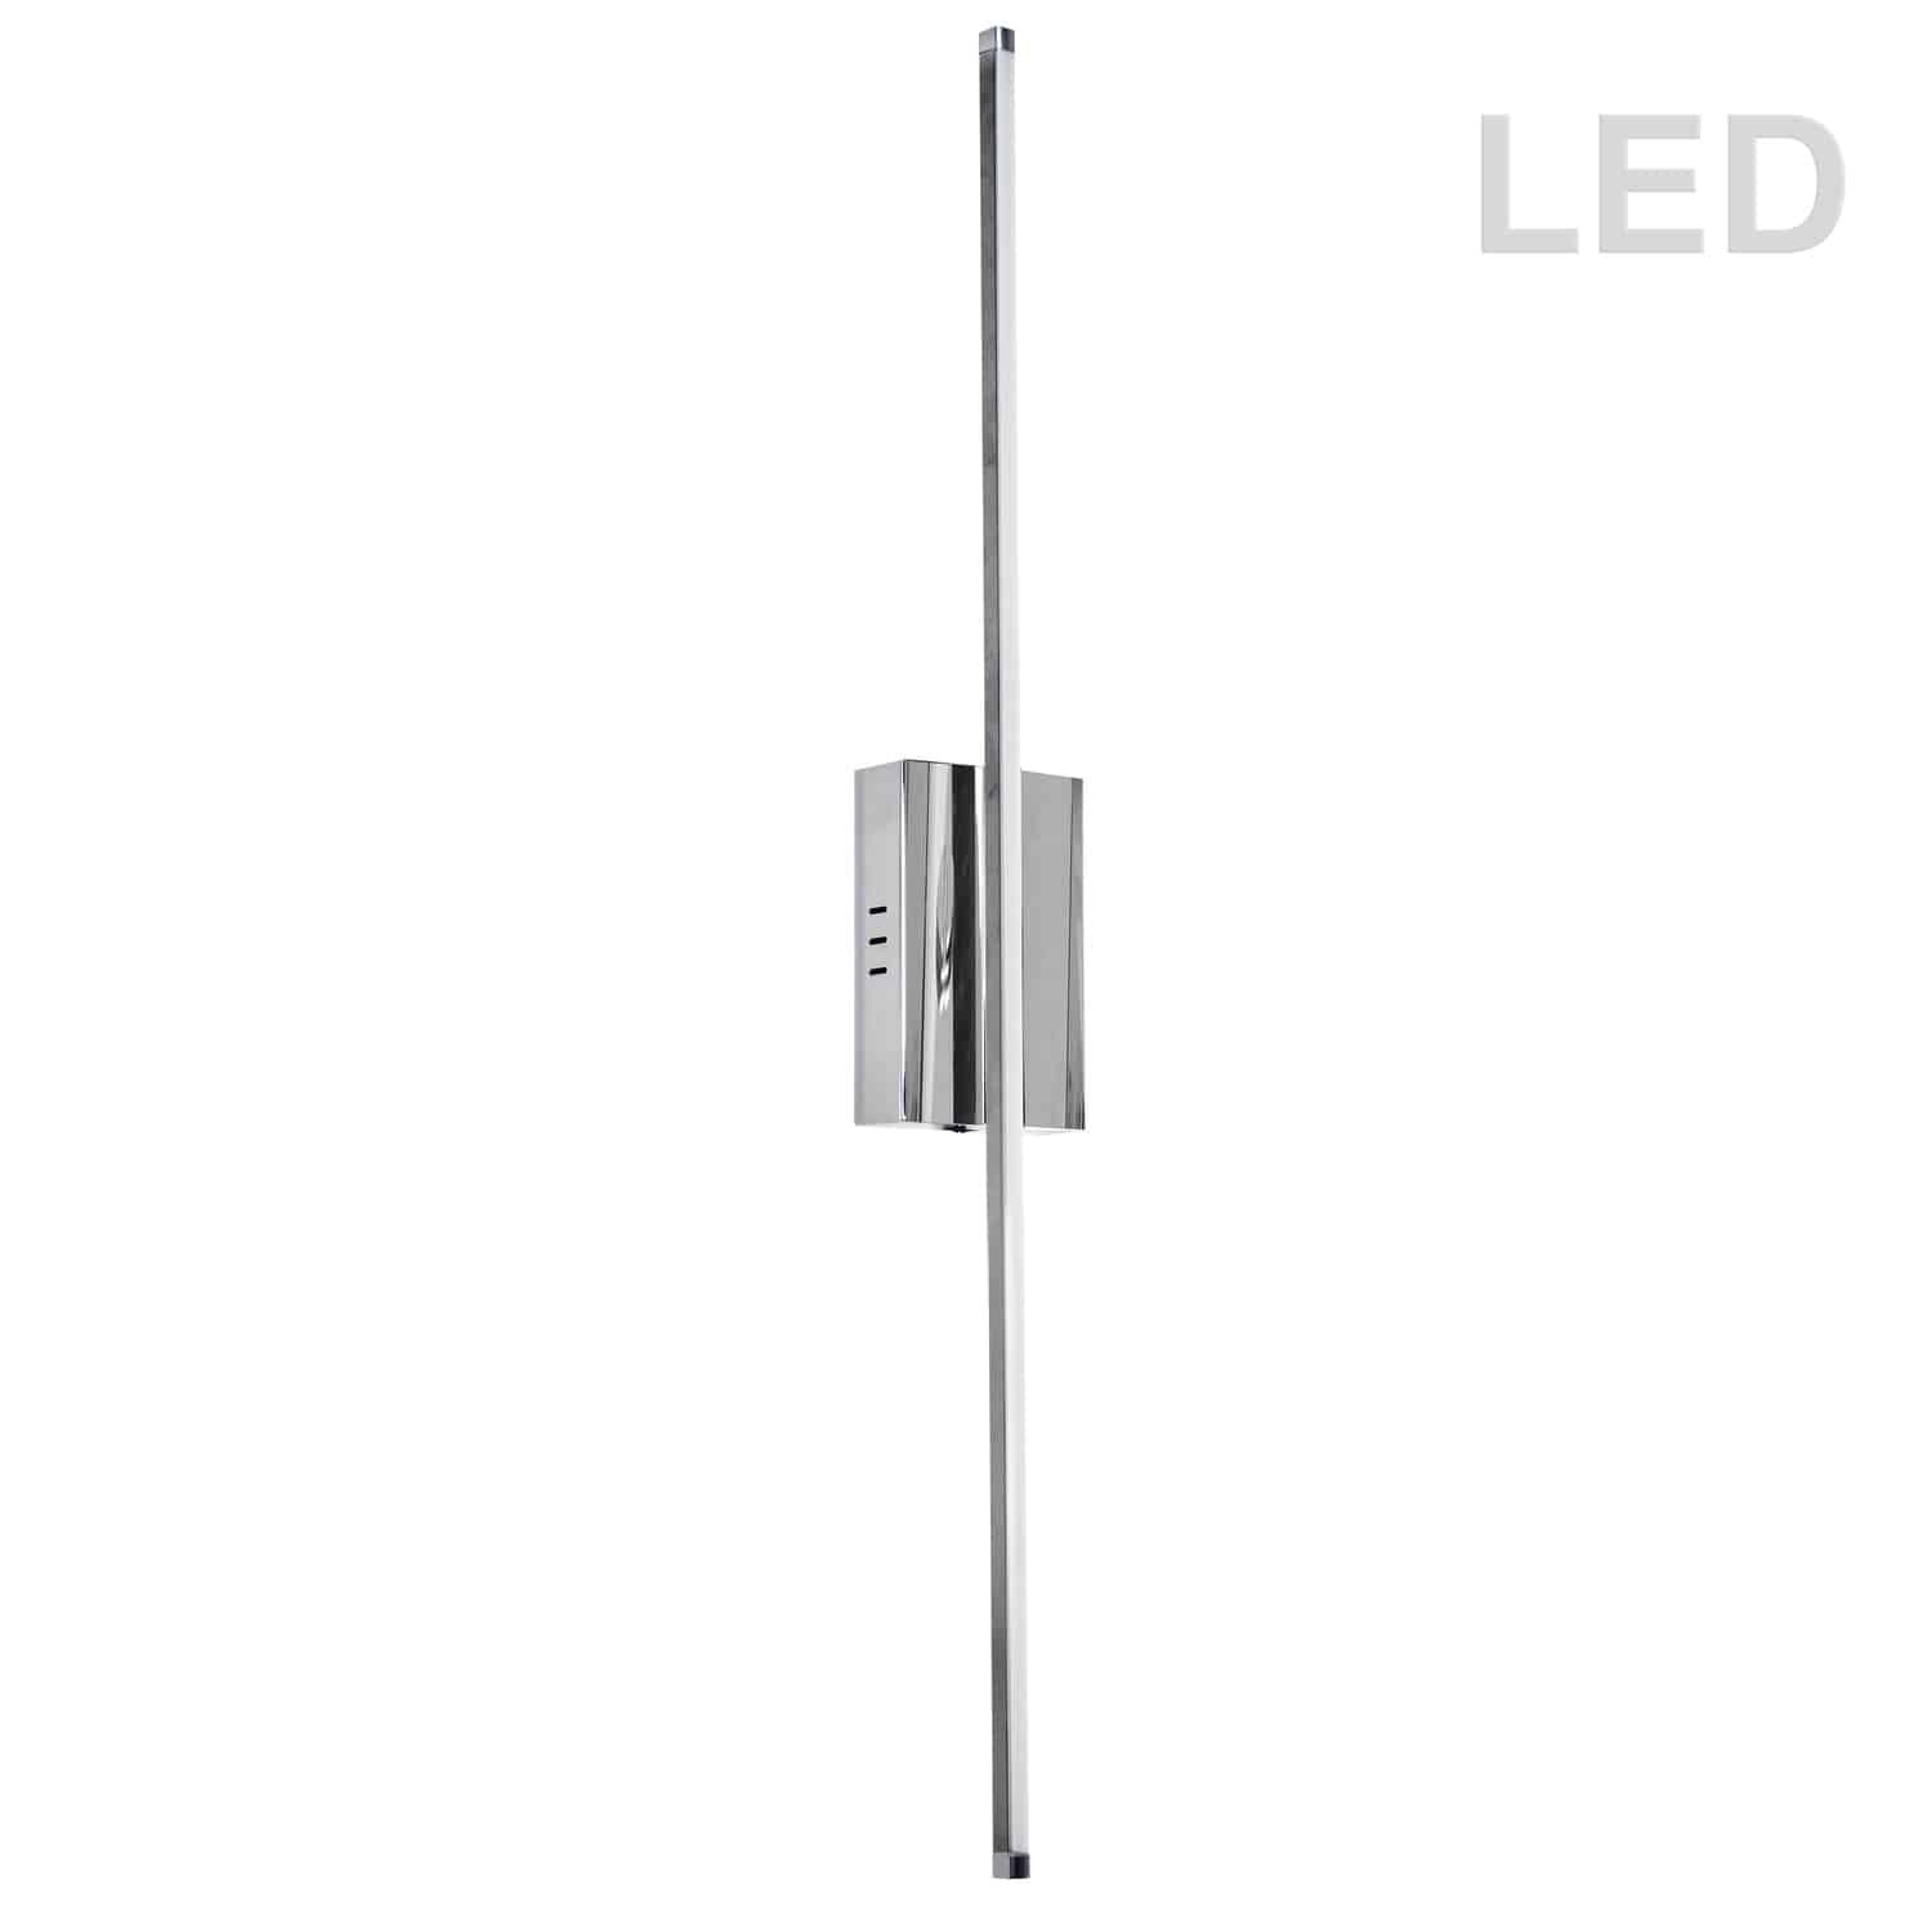 30 Watt LED Wall Sconce Polished Chrome w/White Acrylic Diffuser